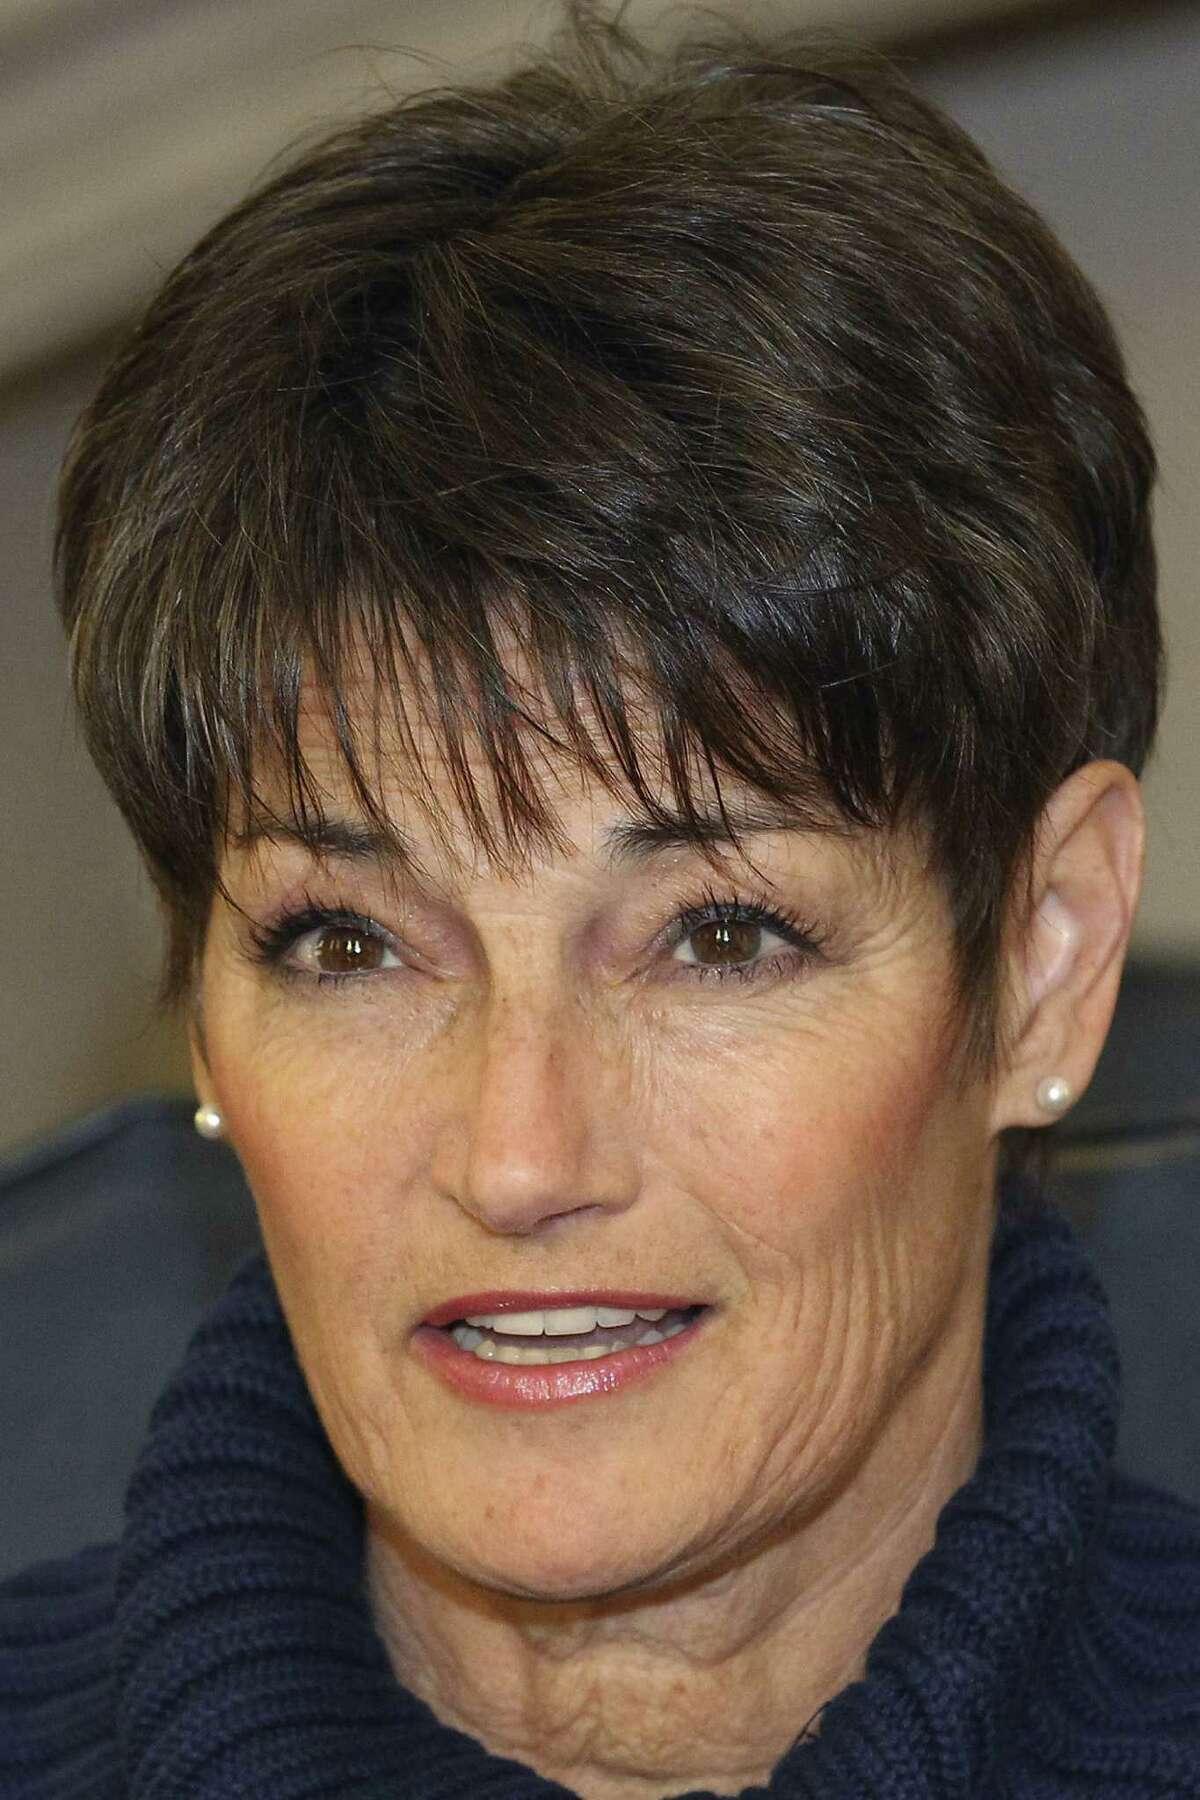 Donna Campbell represents Texas Senate District 25.